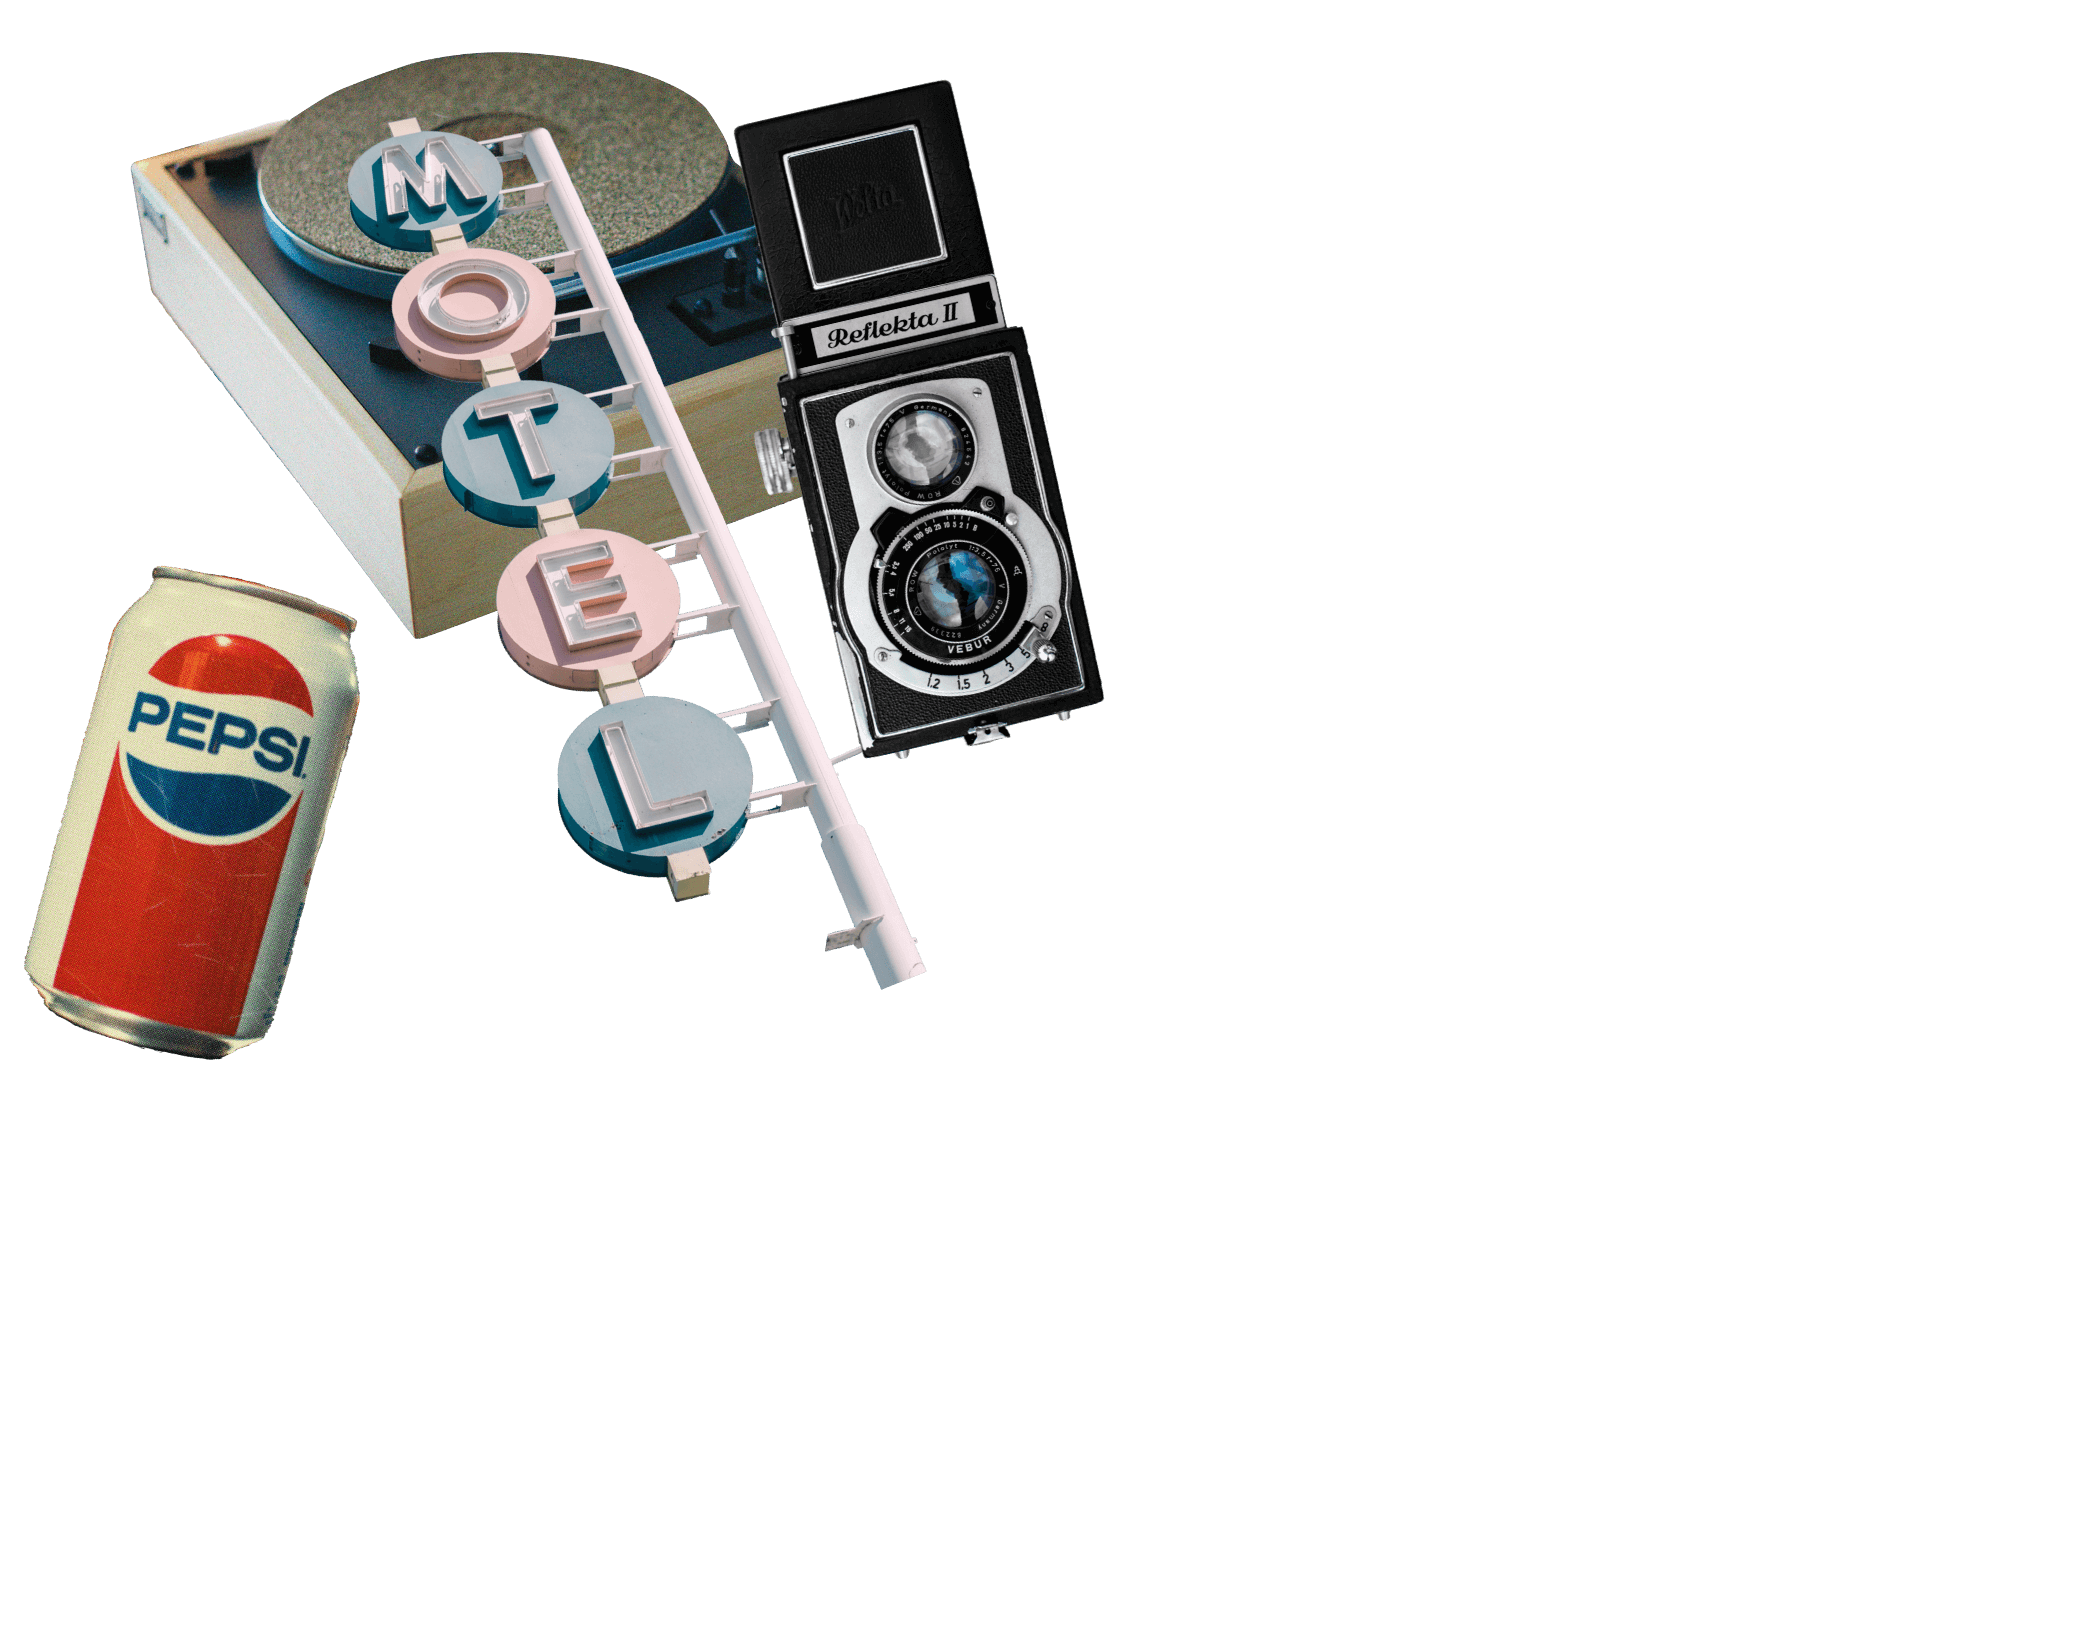 train rockole radio casette polaroid girl isolate silhoutte